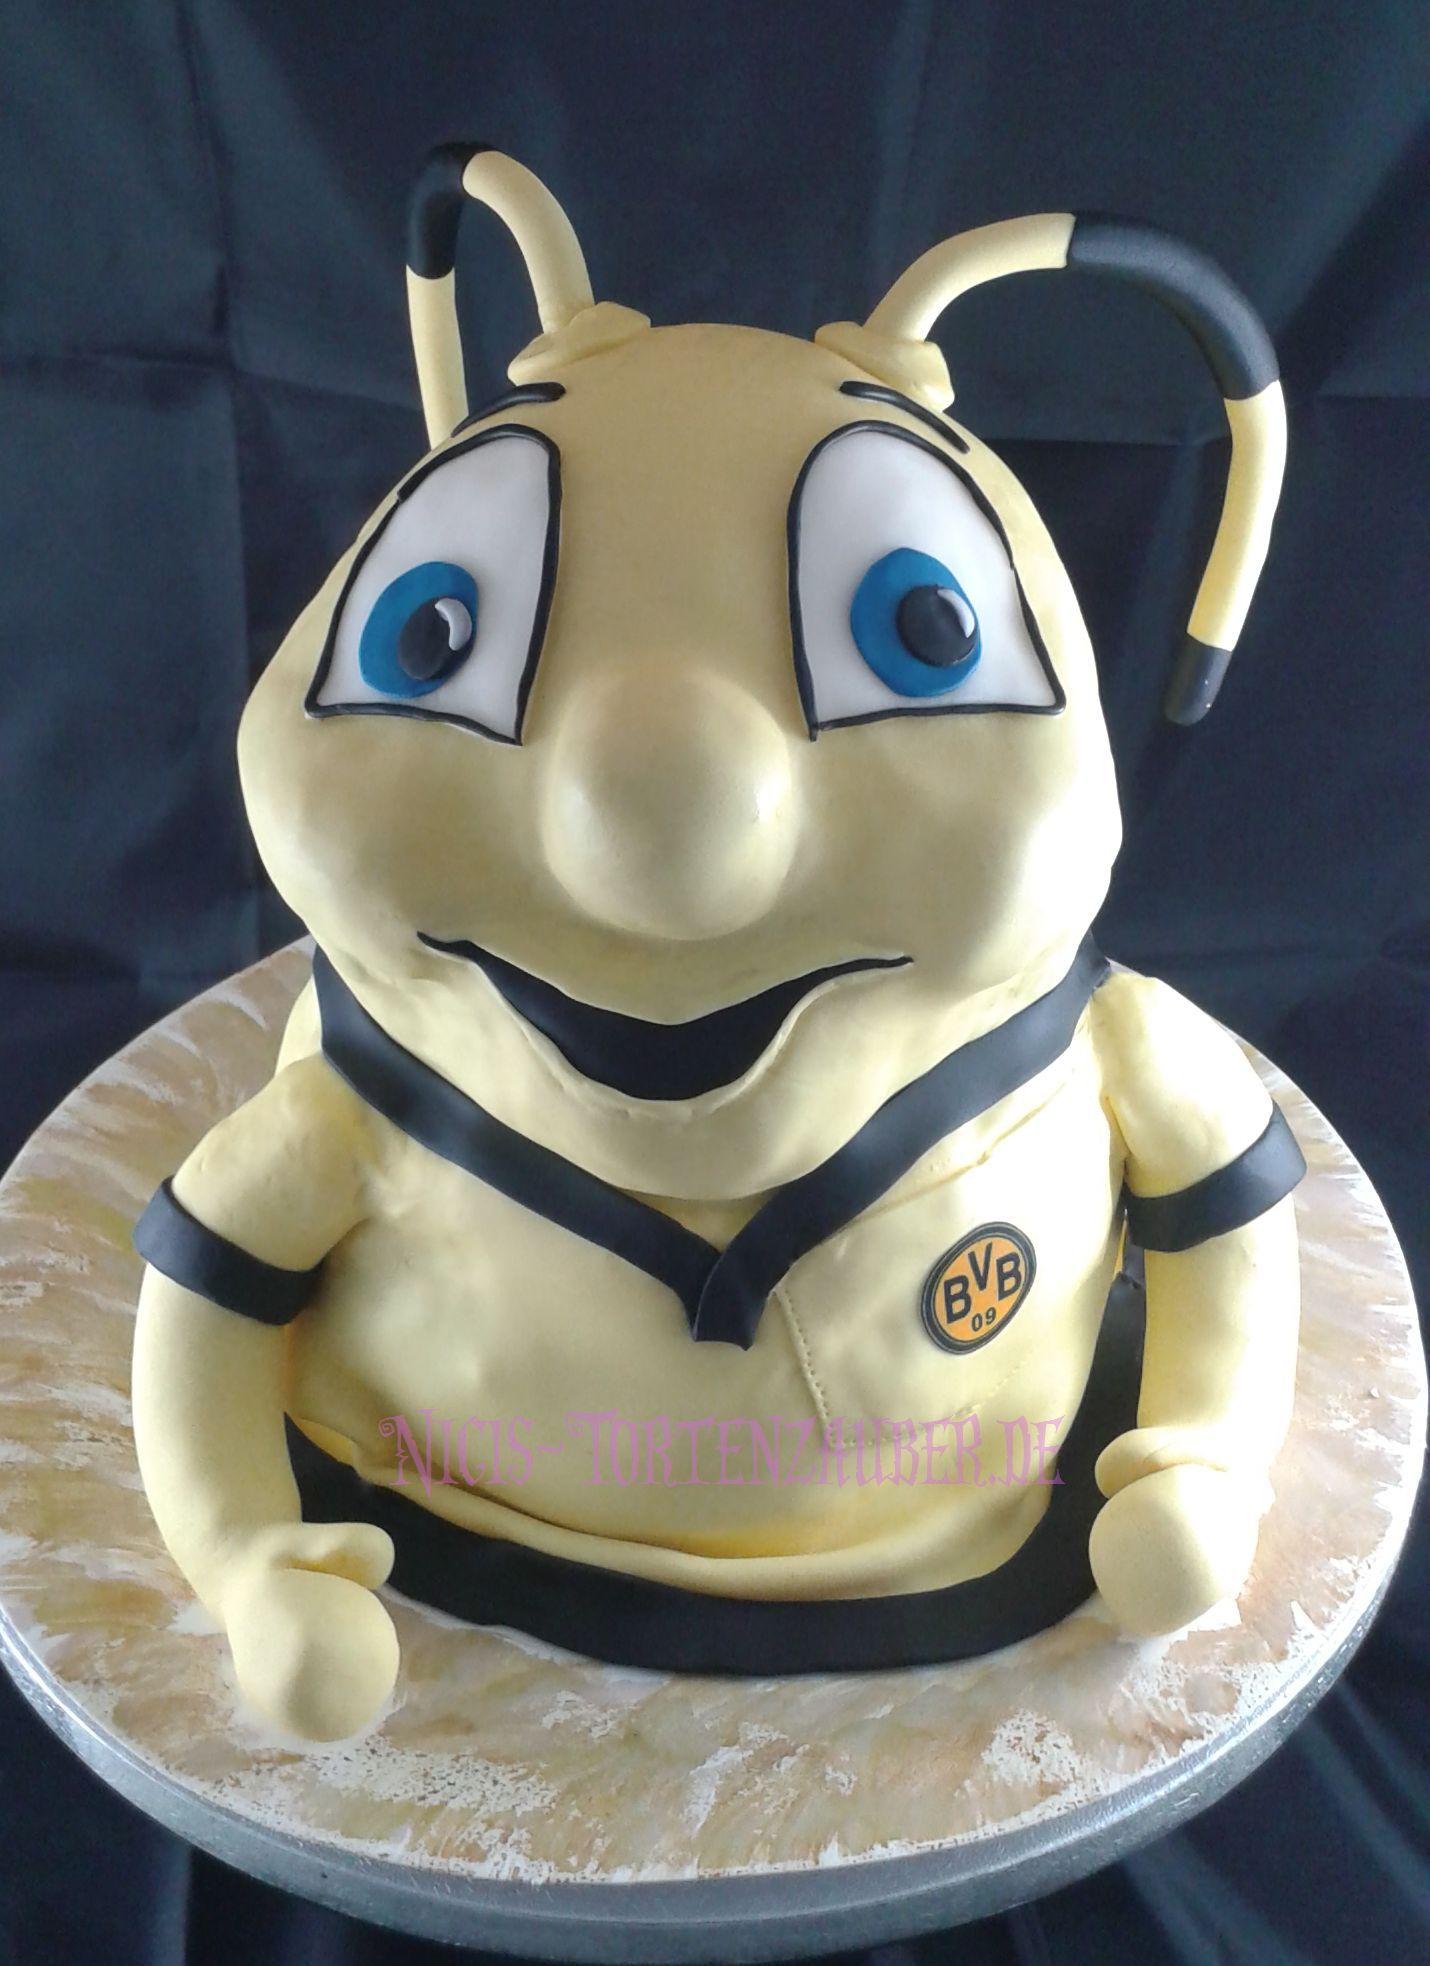 Biene emma torte kuchen cake bvb dortmund for Kuchen dortmund